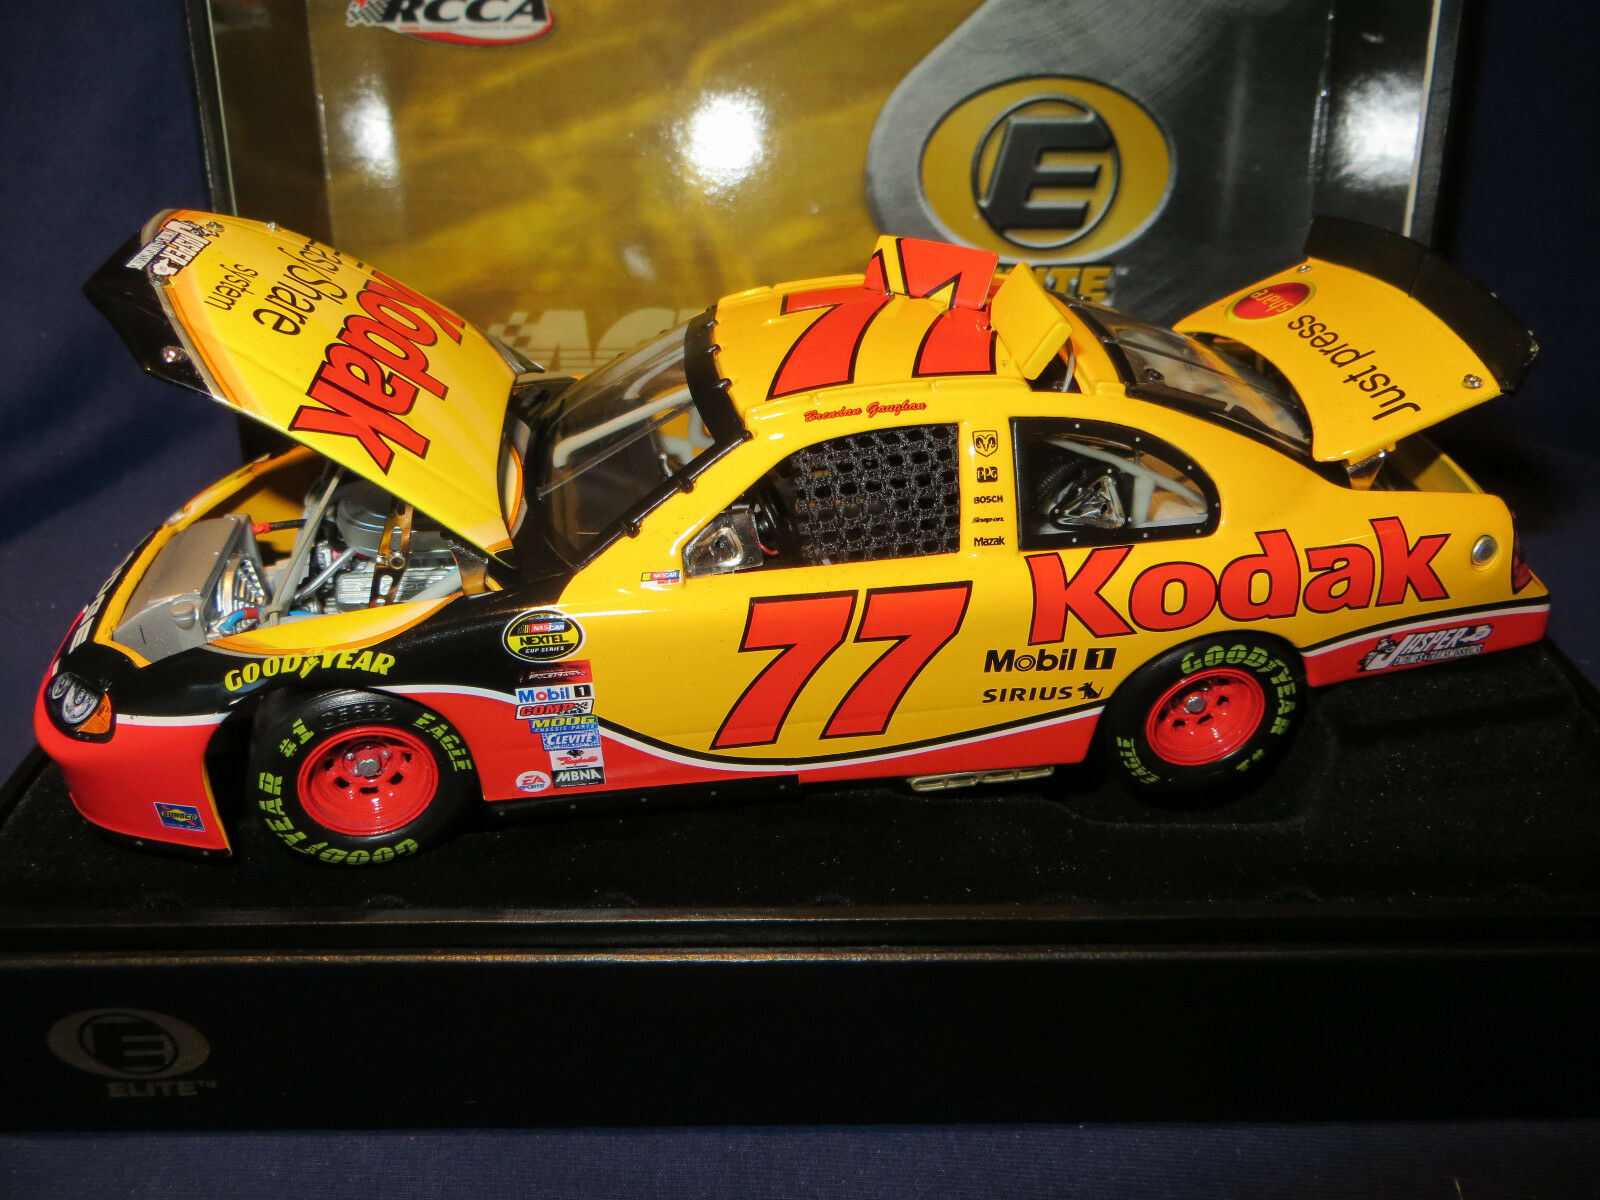 Brendan Gaughan;77 Kodak 2004 Dodge Intrepid 358;128 288 1 24 Azione RCCA Elite